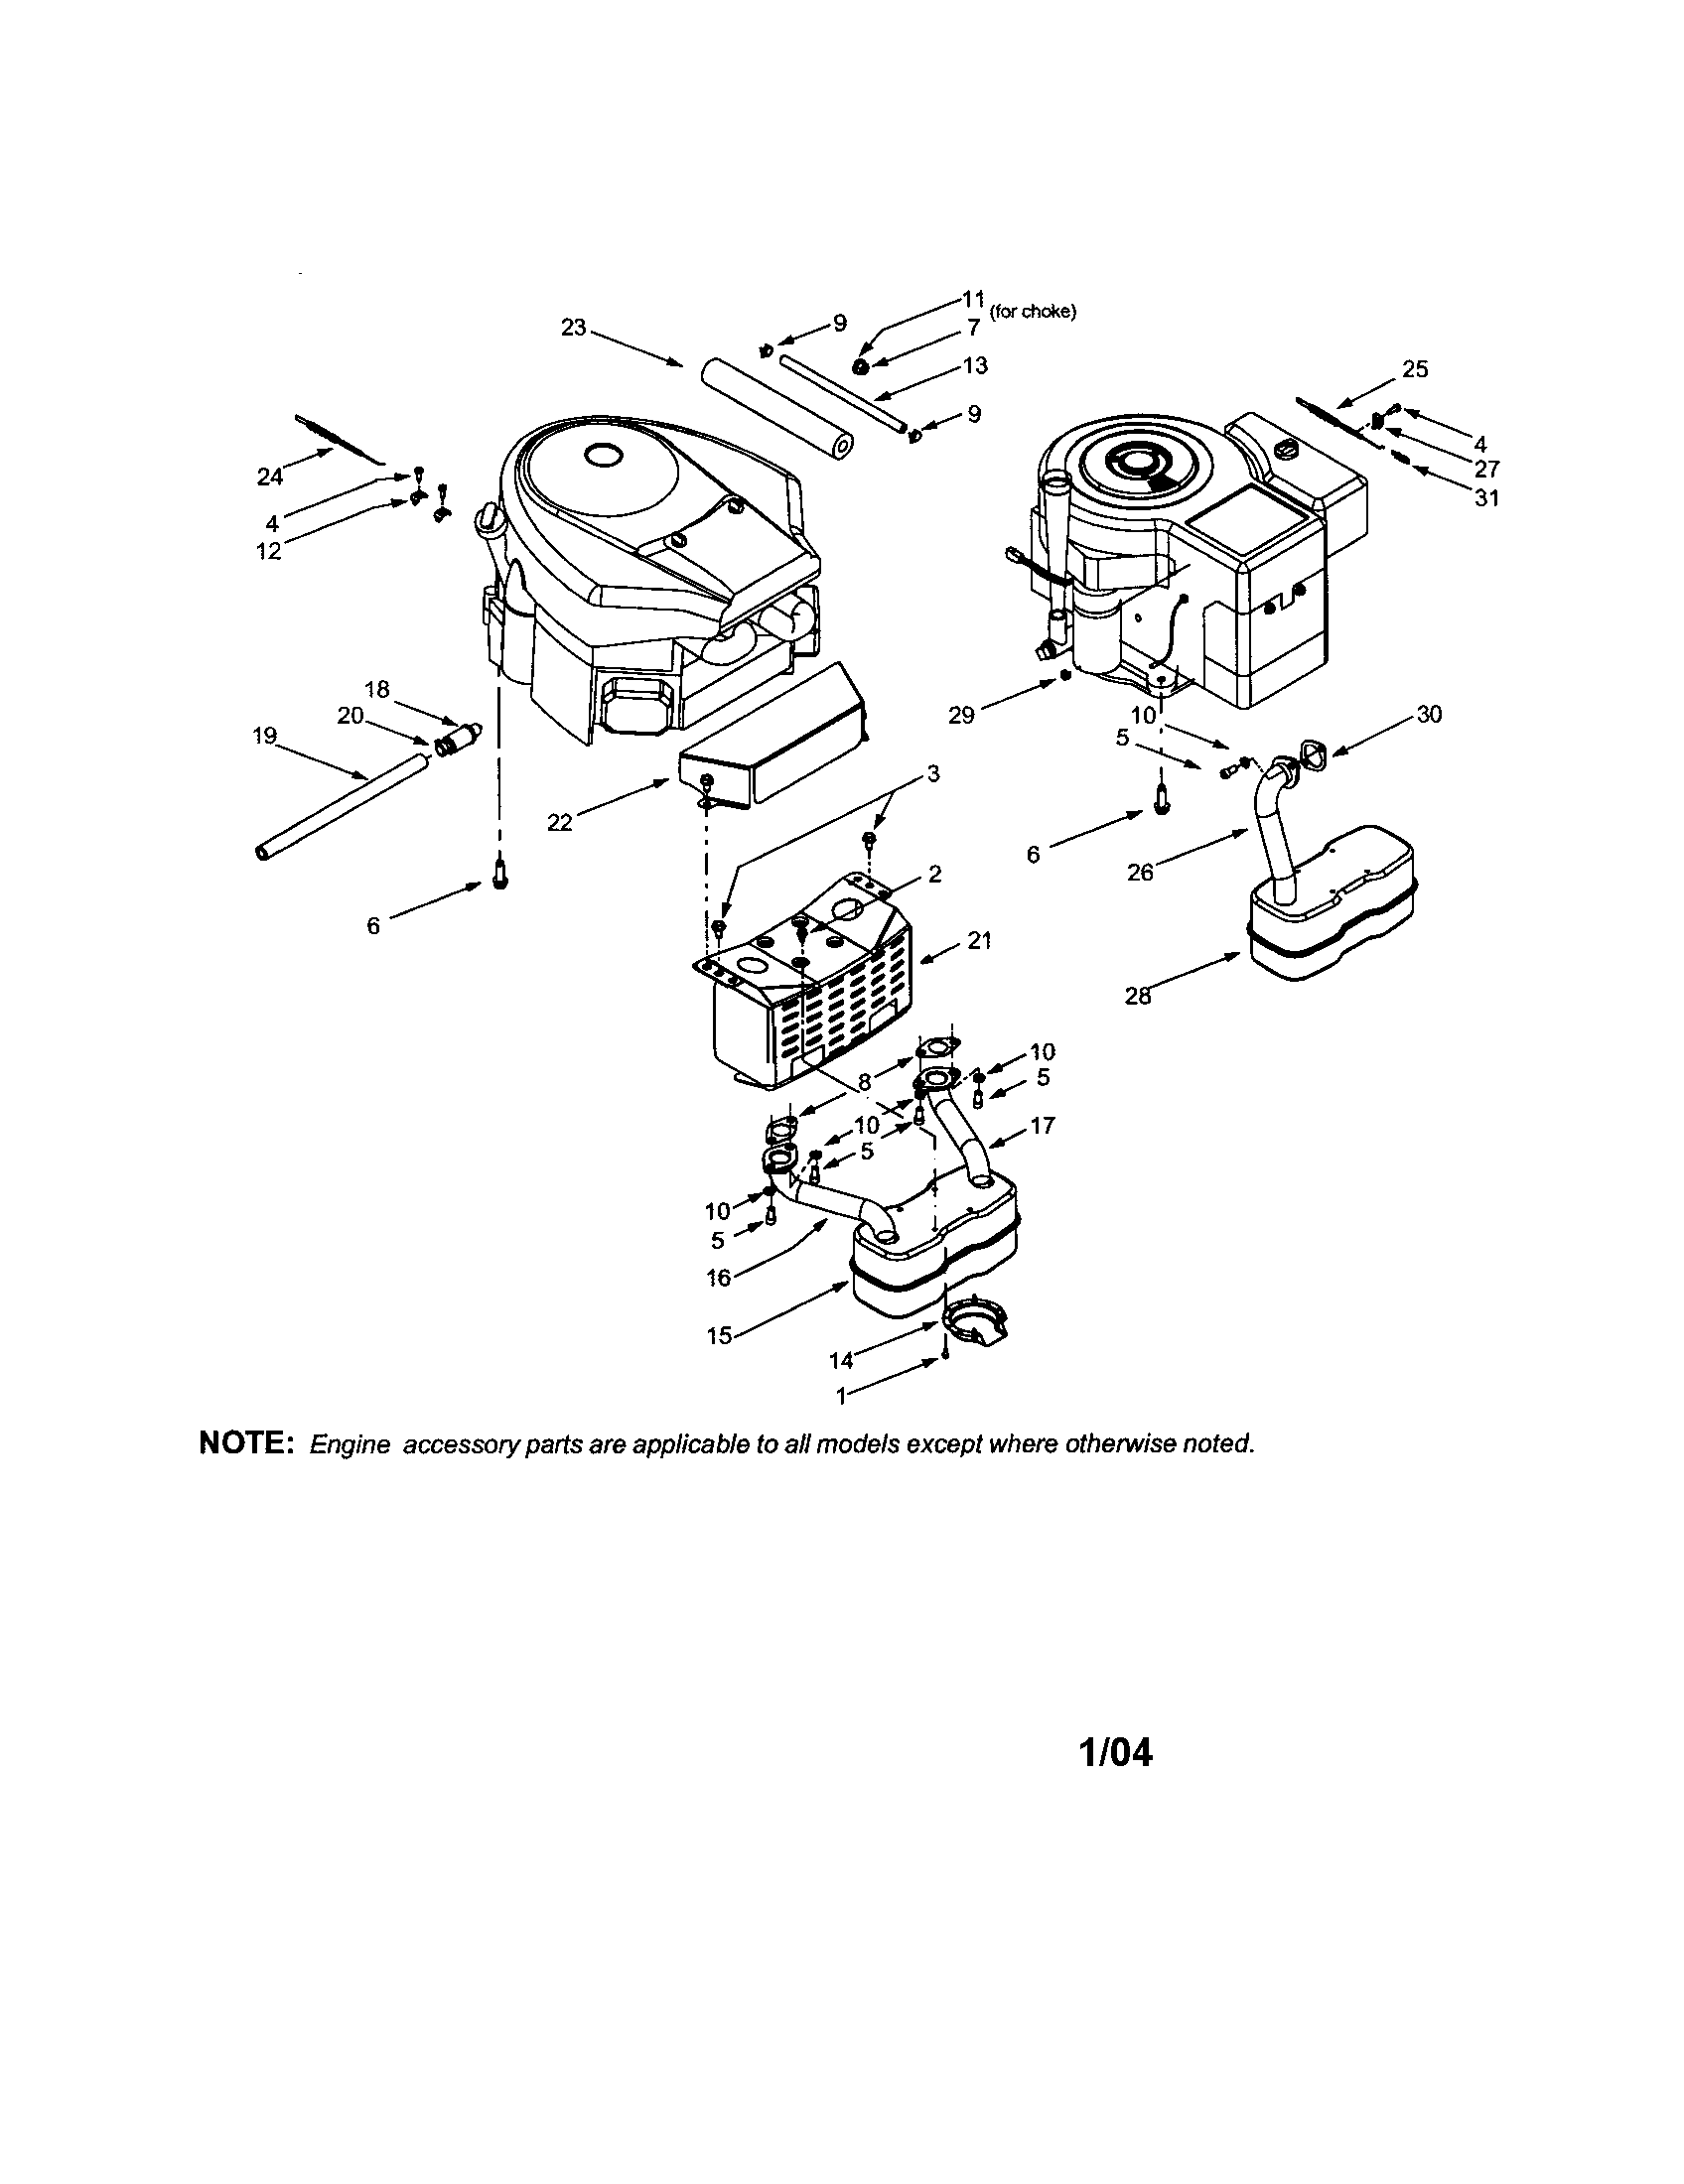 Troy Bilt Pony Wiring Diagram. Parts. Wiring Diagram Images